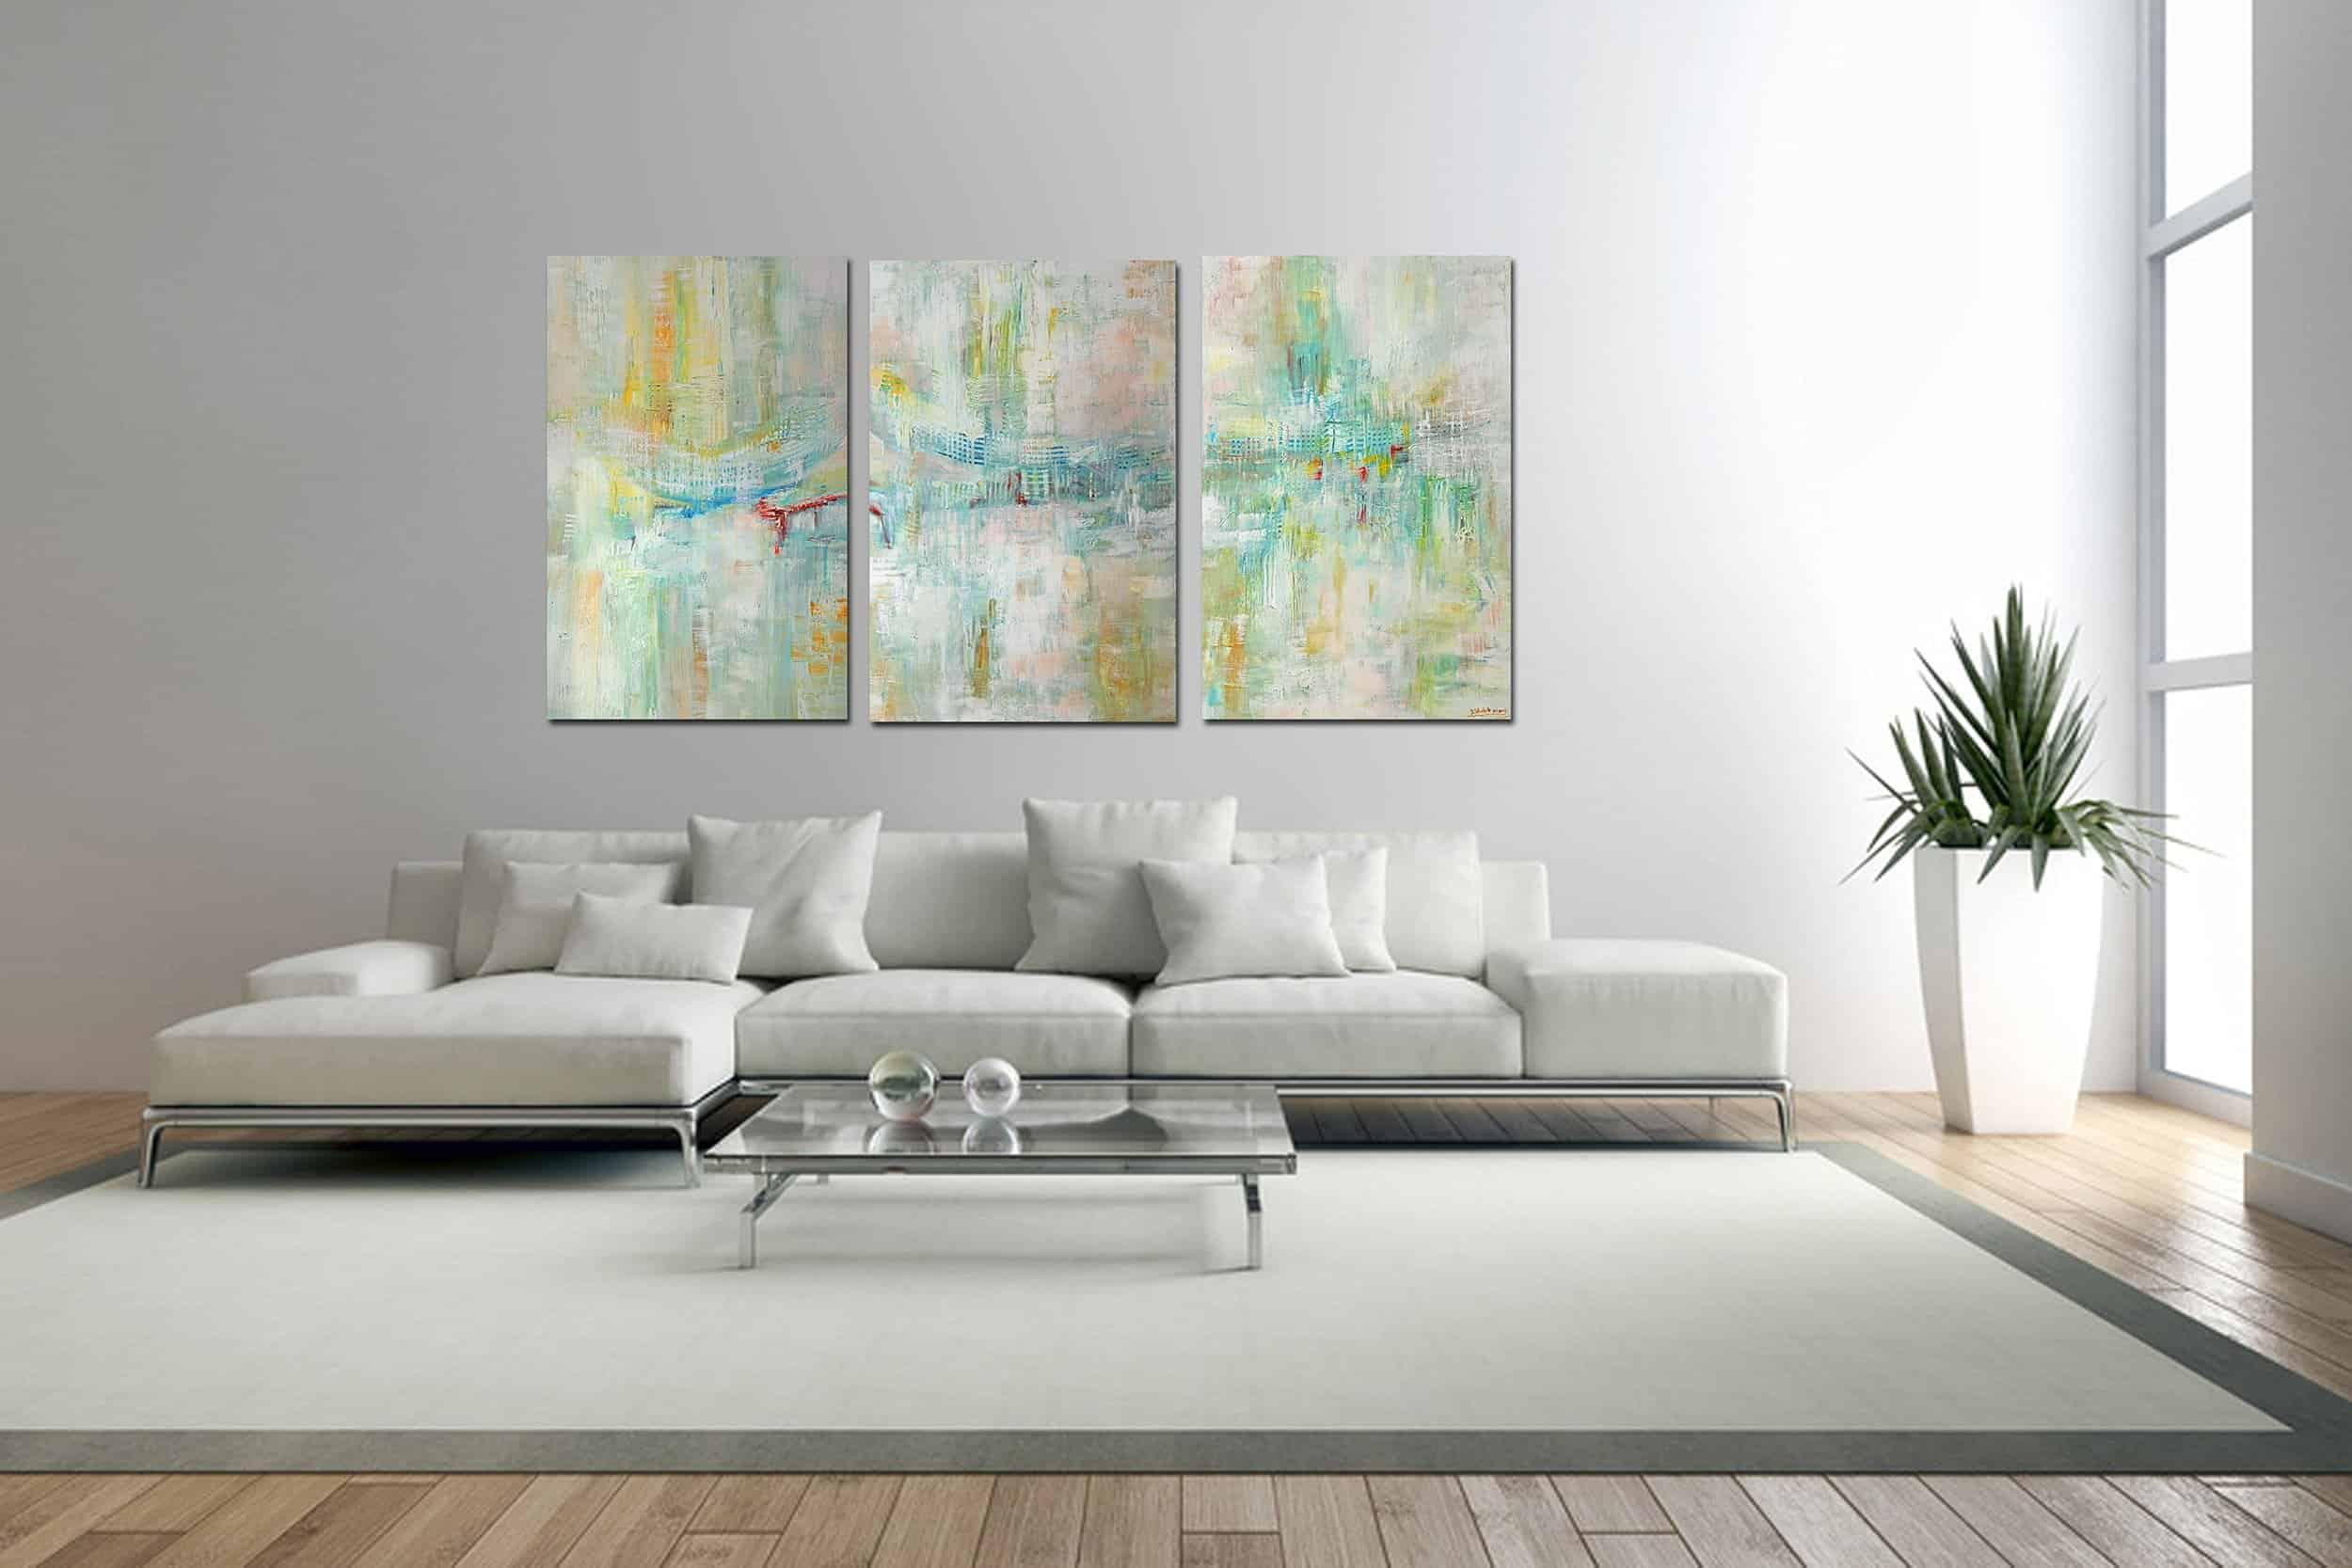 Peripherie Triptychon sold